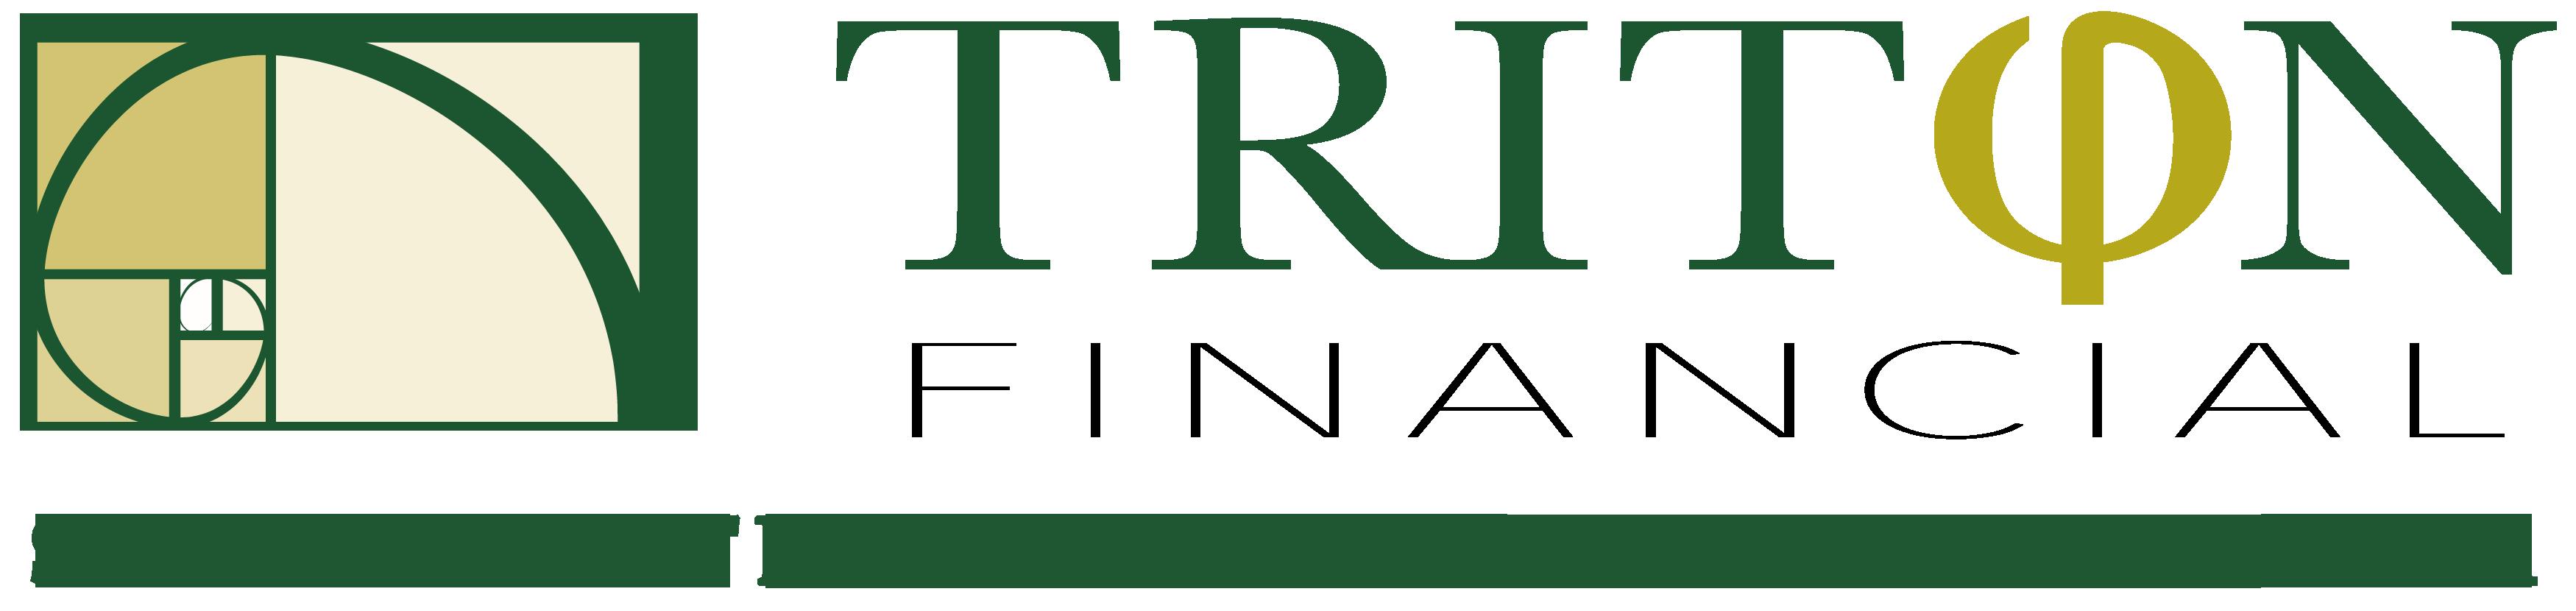 Triton Financial logo